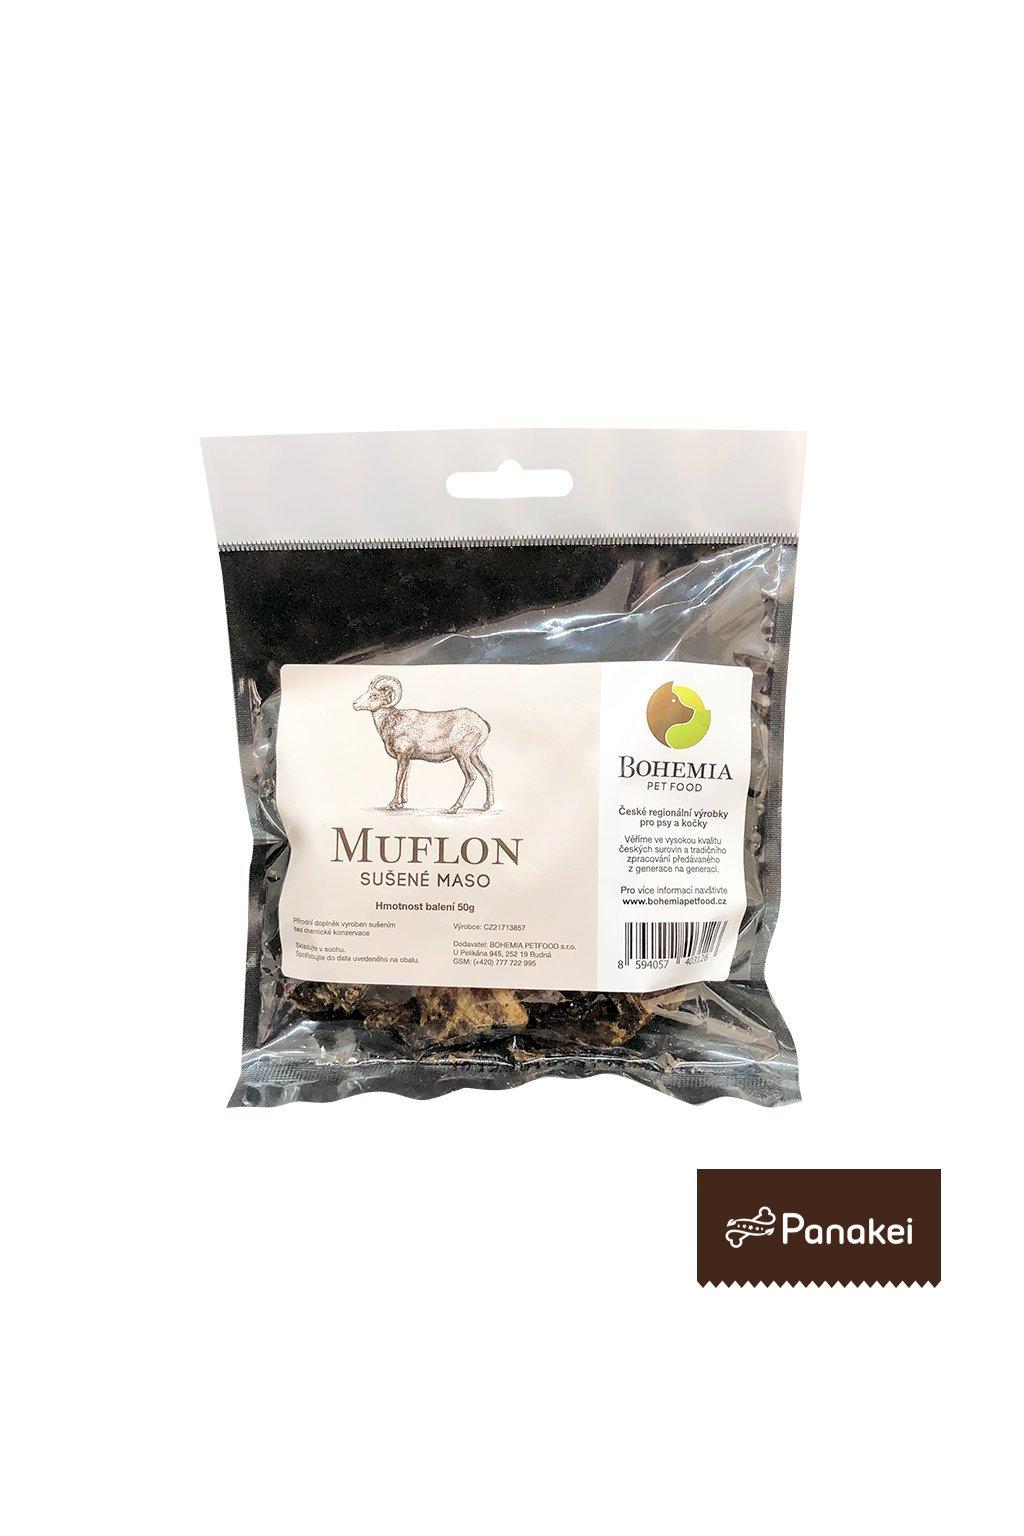 bohemia pet food susene maso muflon